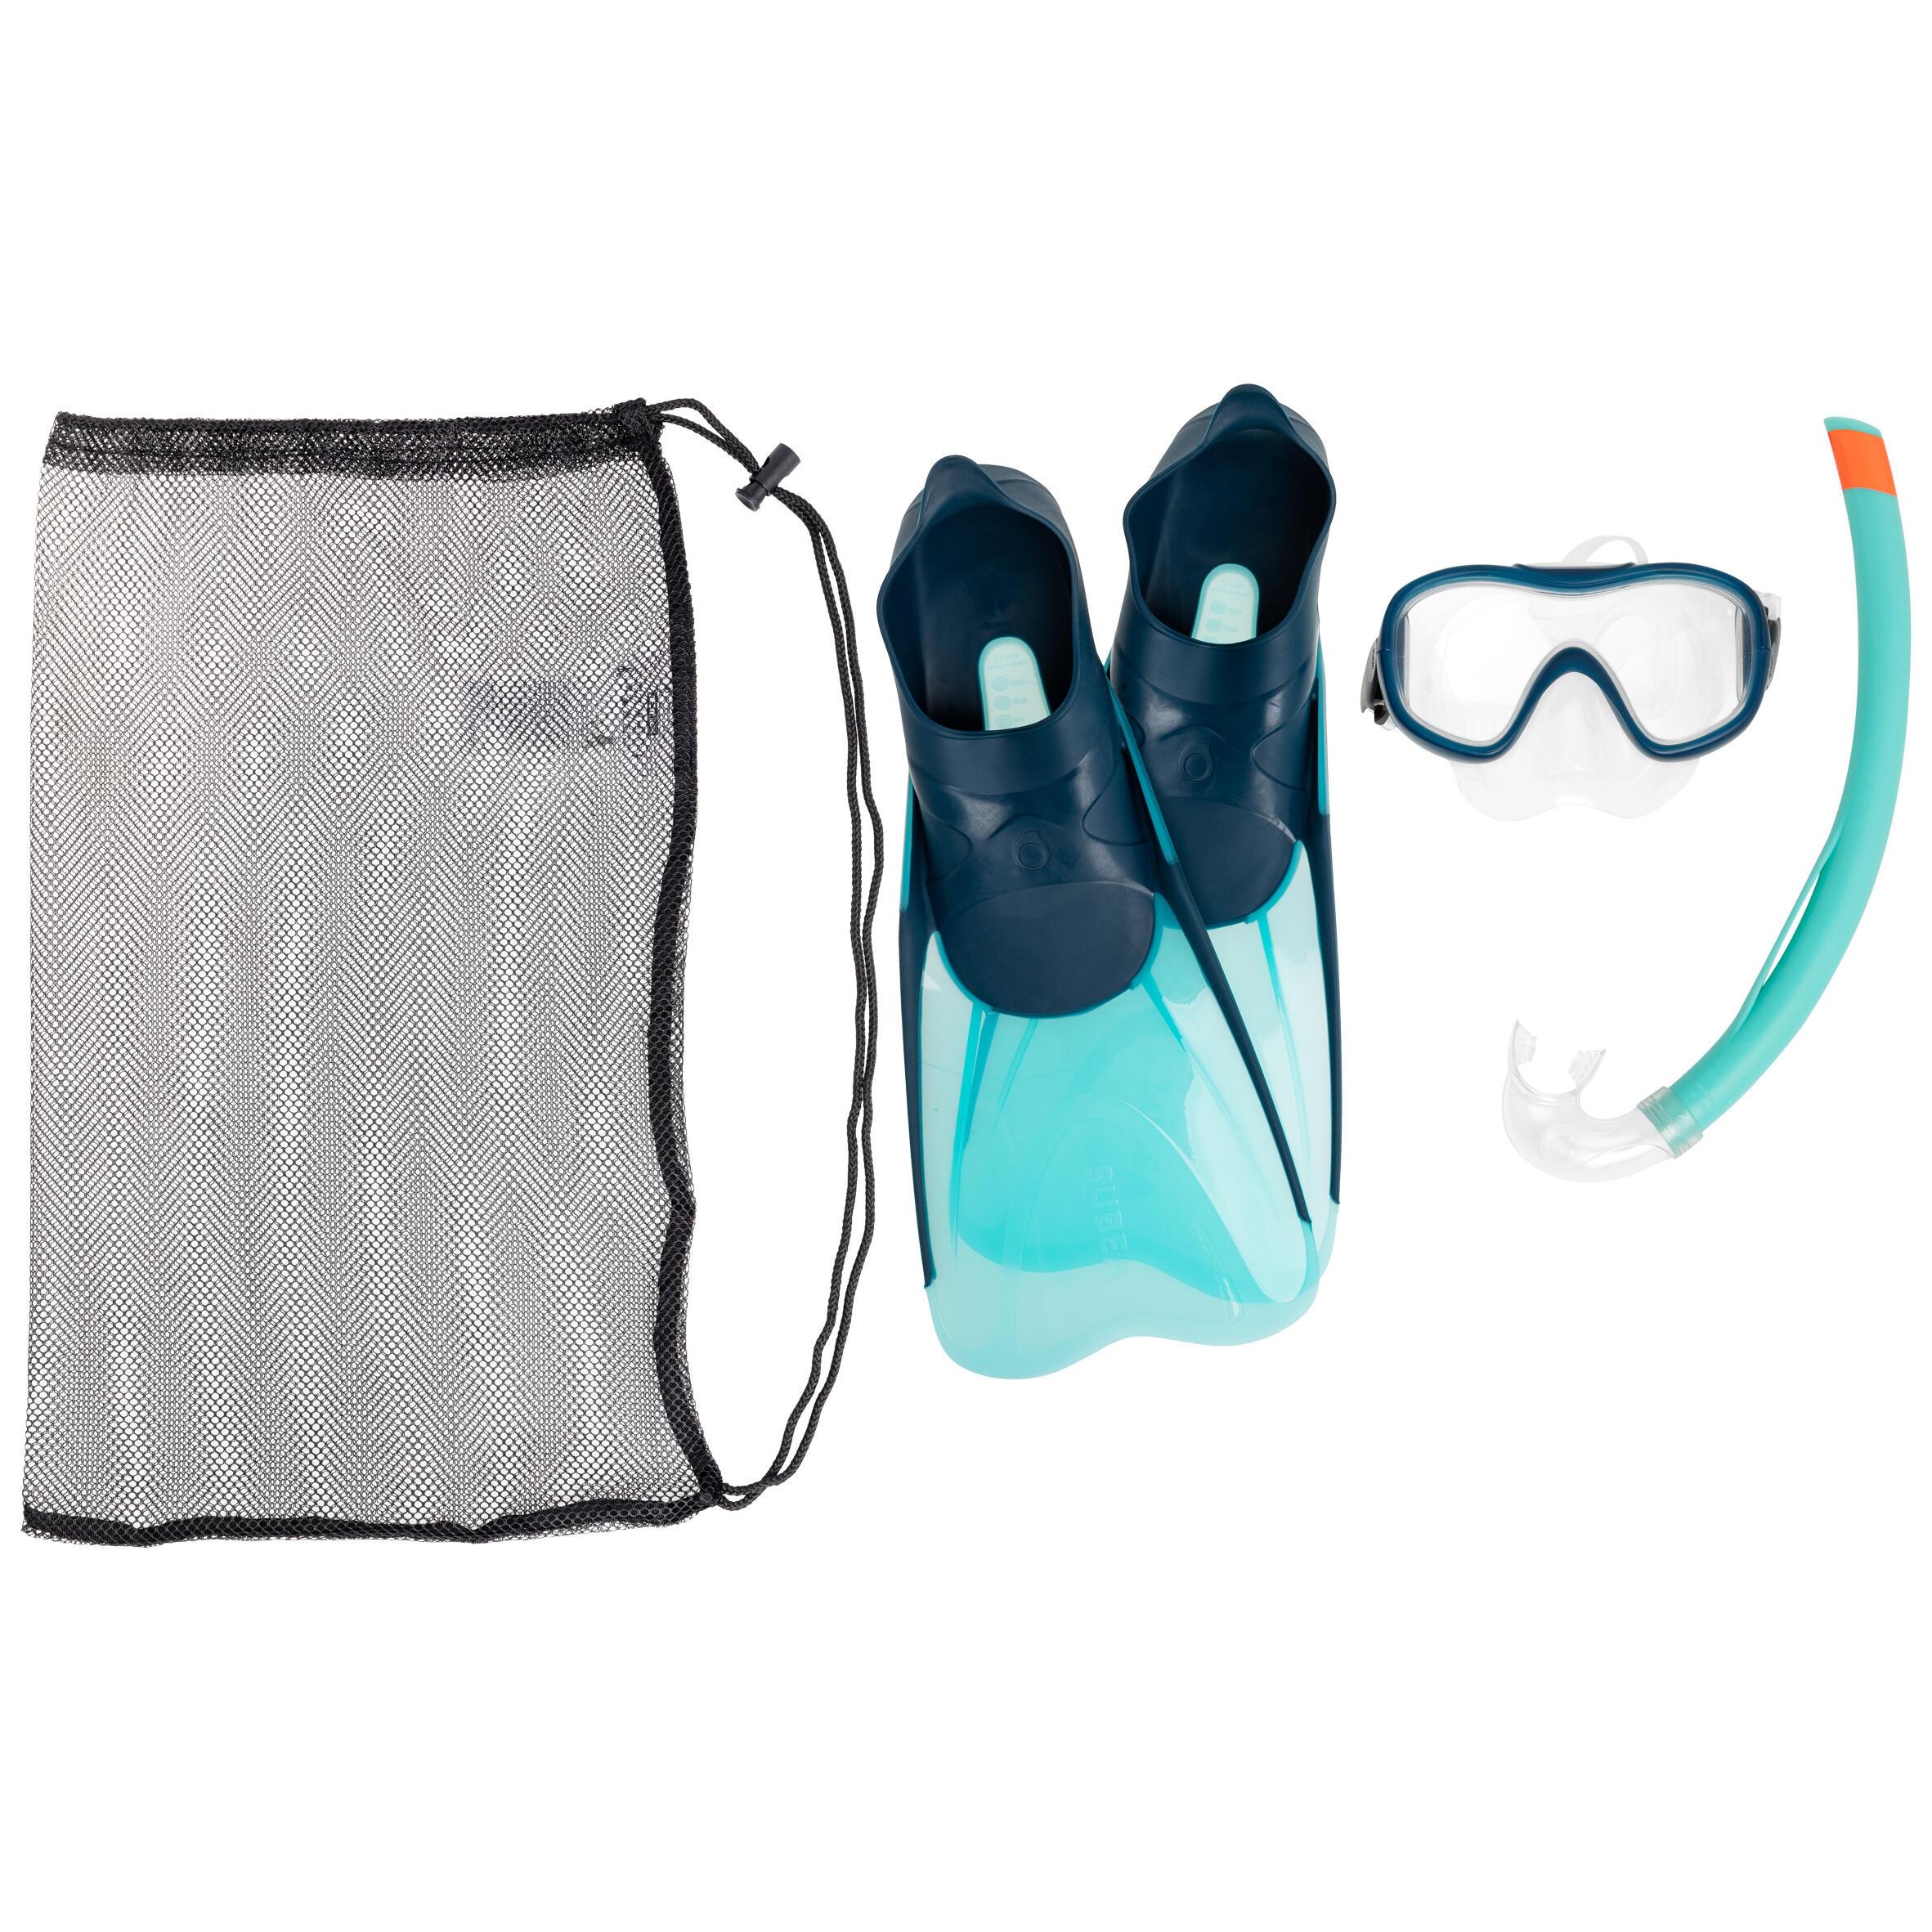 Kid's Snorkelling Kit Mask Snorkel SNK 500 turquoise - UK C11.5-12 EU30-31 By SUBEA   Decathlon